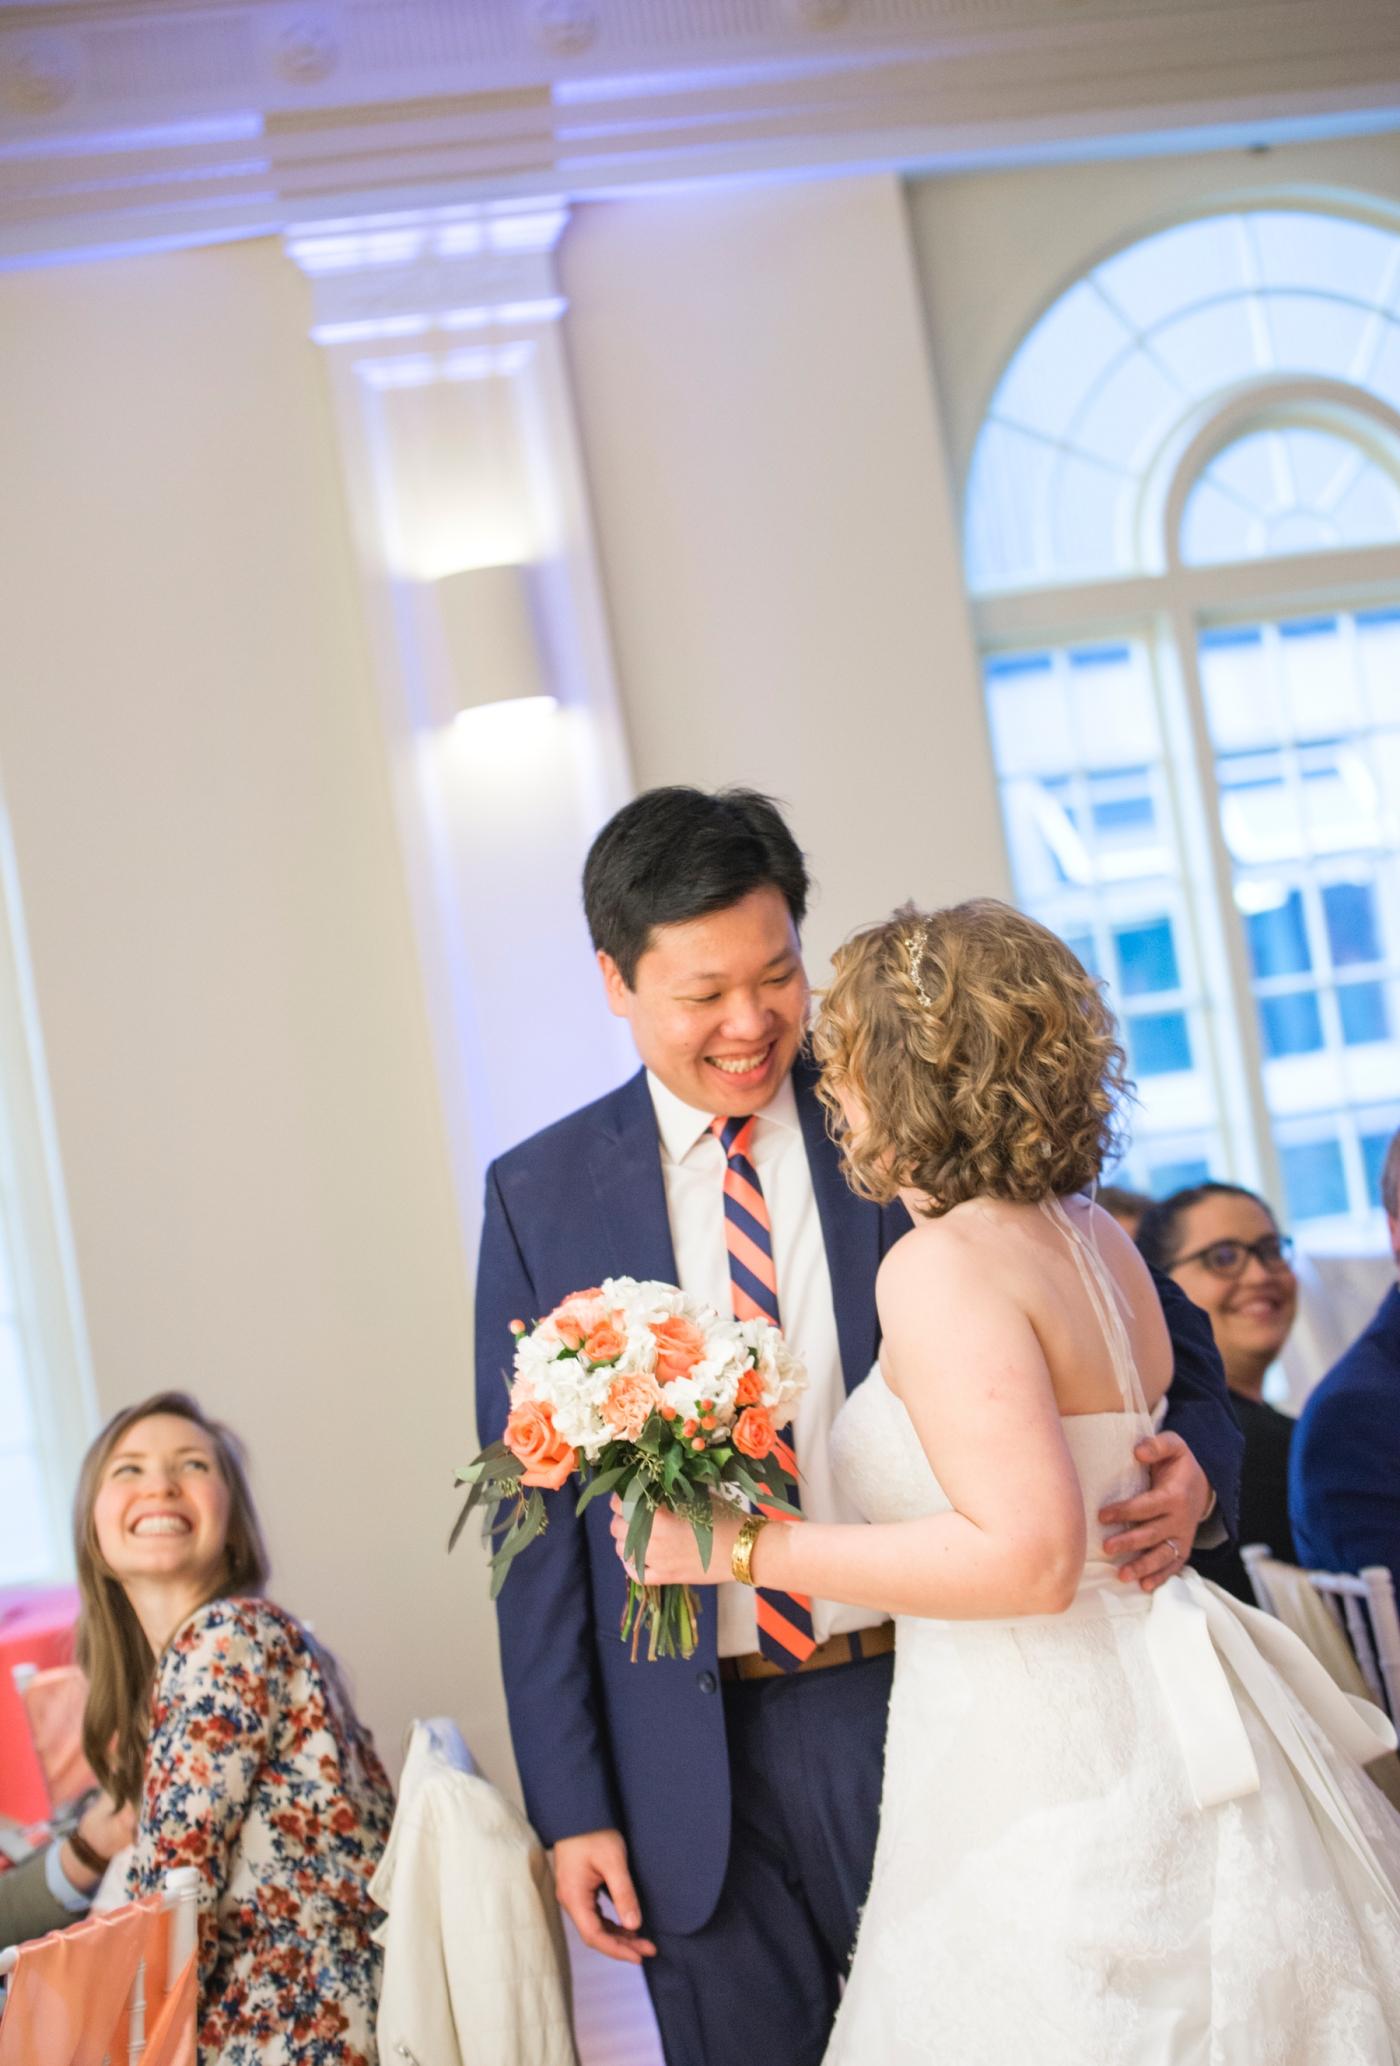 DSC_3167Everett_Wedding_Ballroom_Jane_Speleers_photography_Rachel_and_Edmund_reception_2017